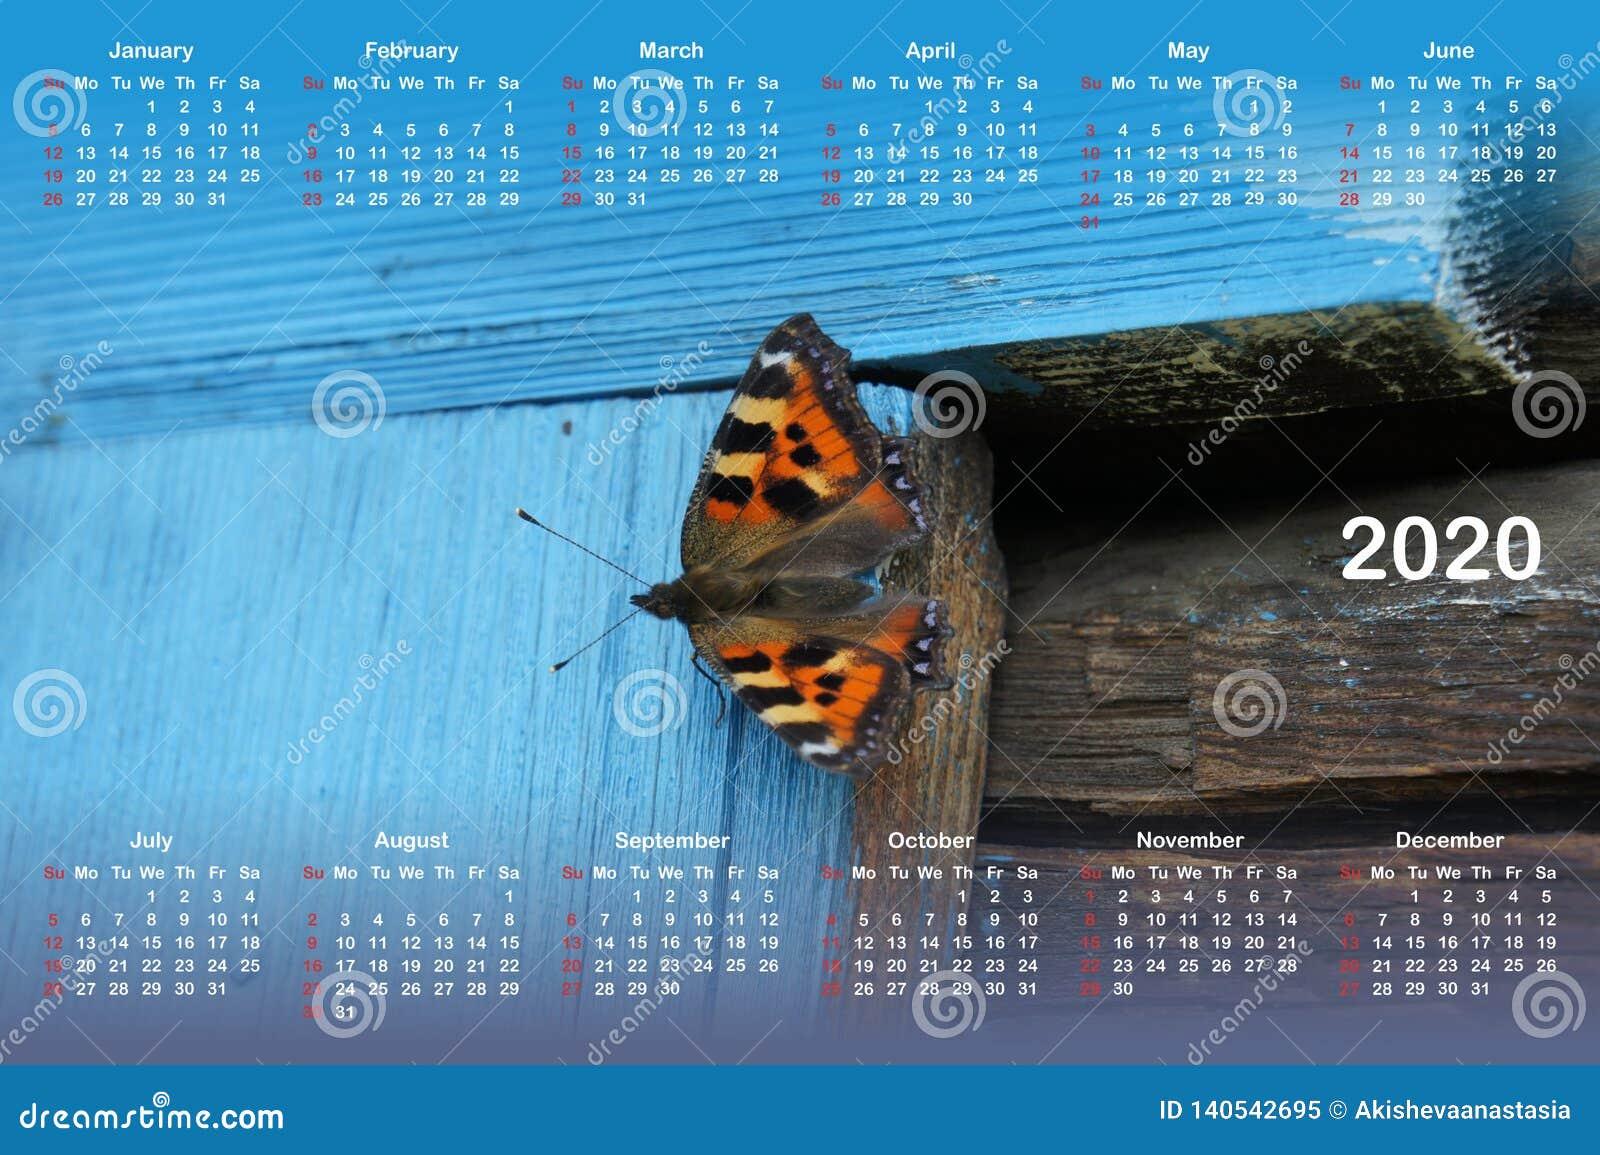 Calendar for 2020.